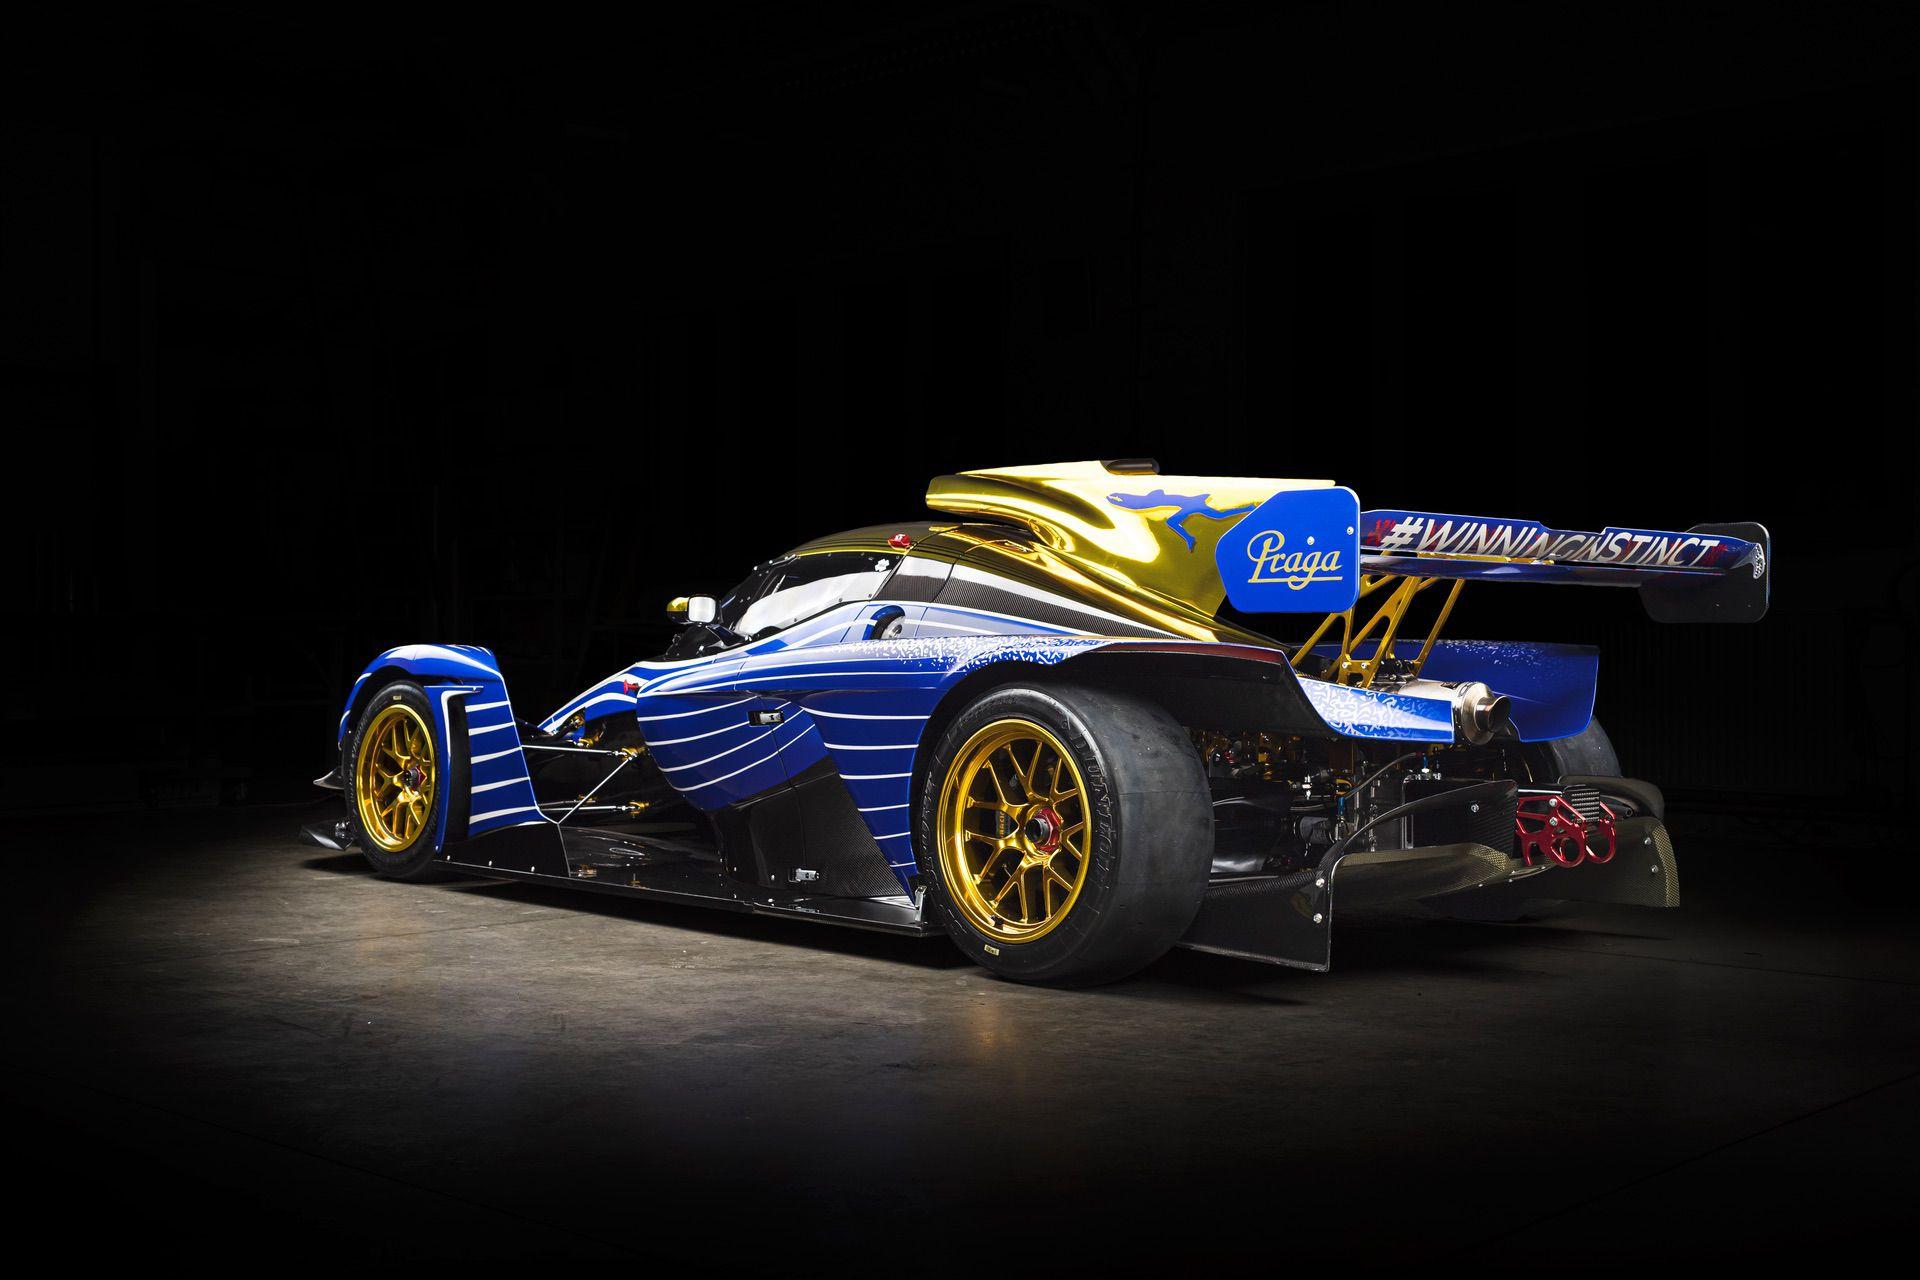 Praga_R1_Frank_Stephenson_racing_livery-0015